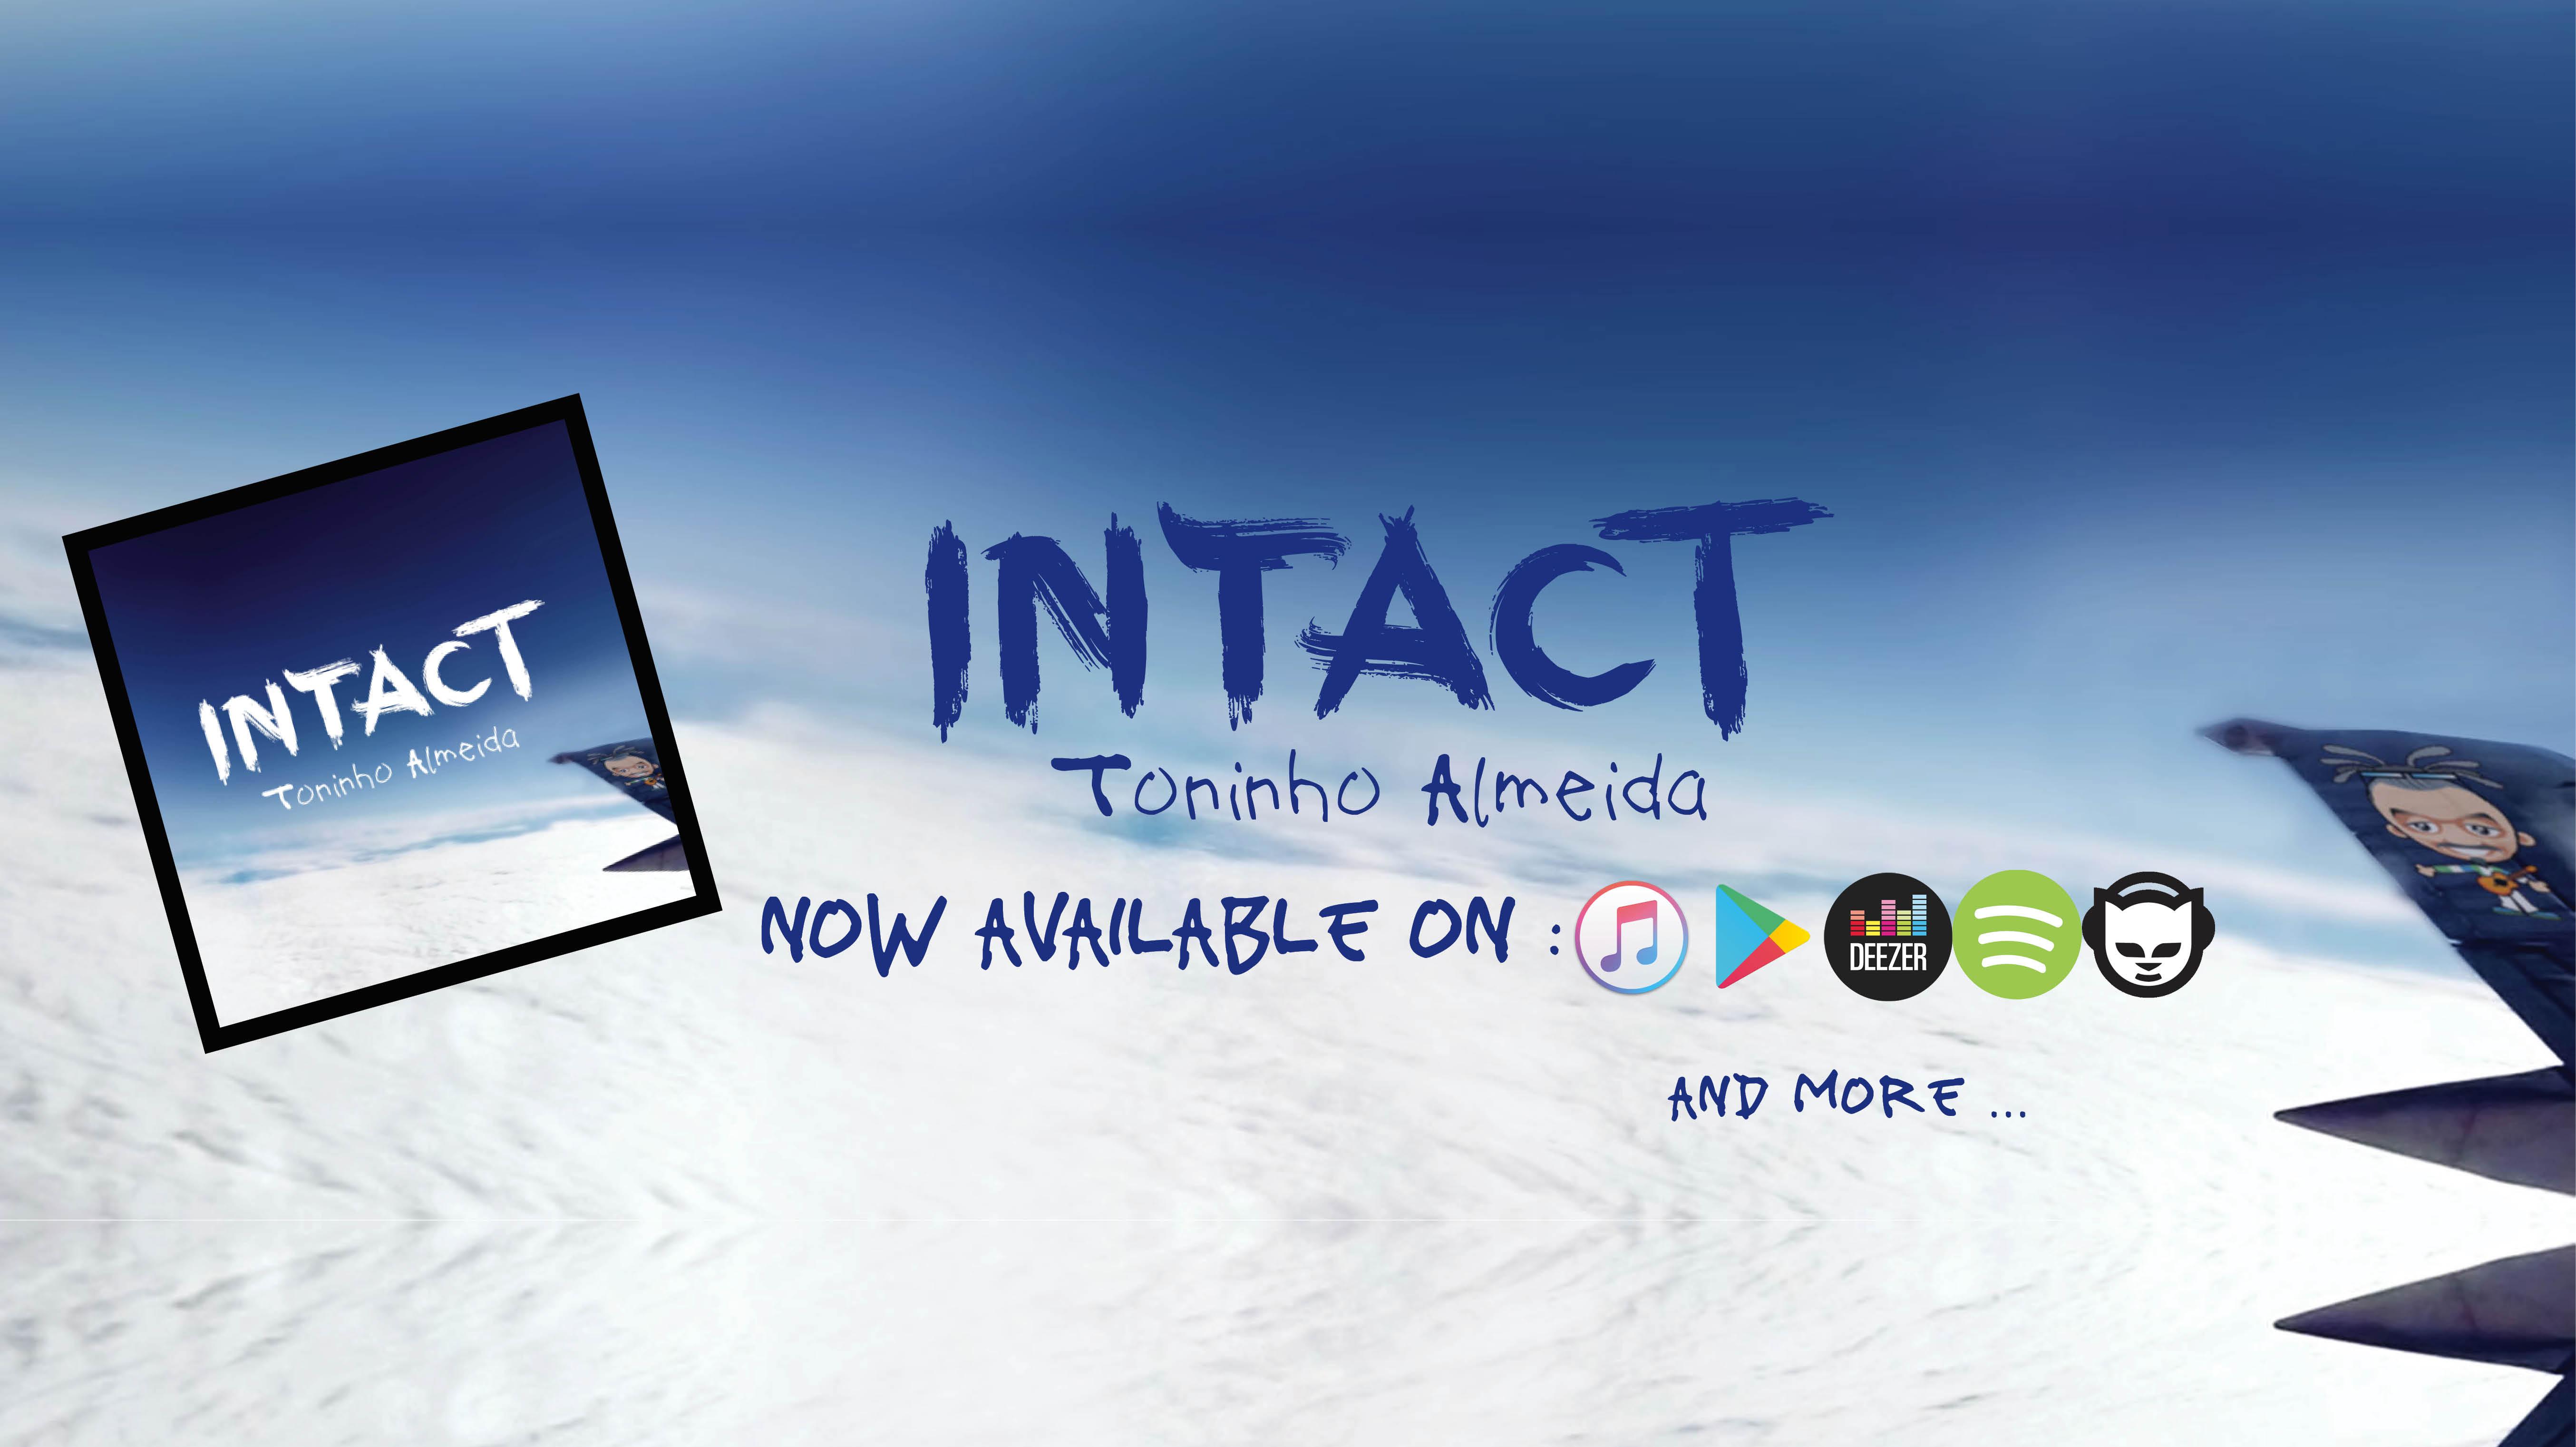 Toninho Almeida - Intact out may 6th